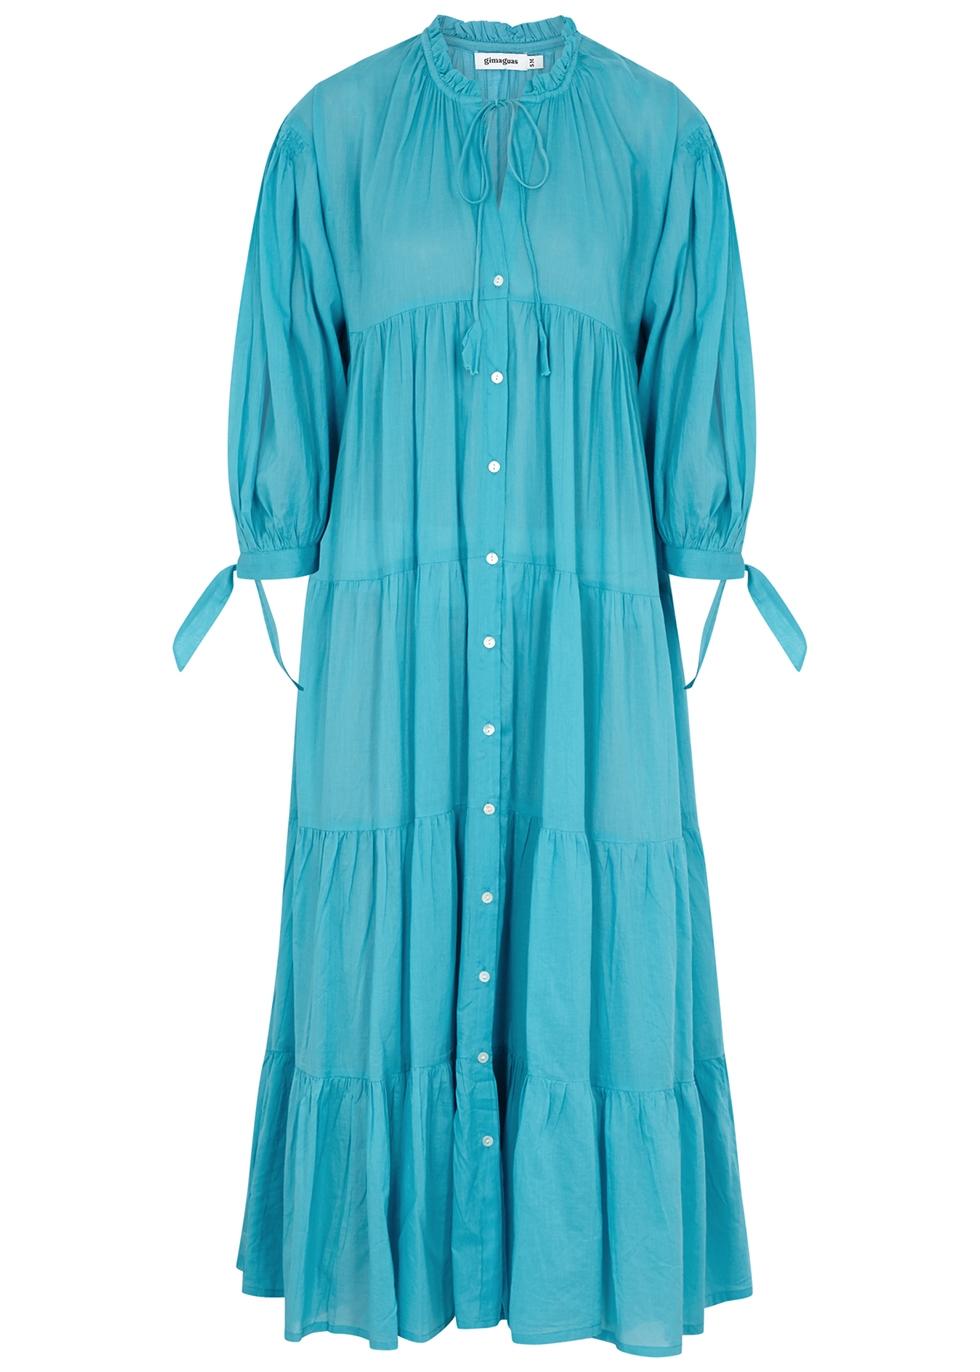 Oahu blue tiered cotton midi dress